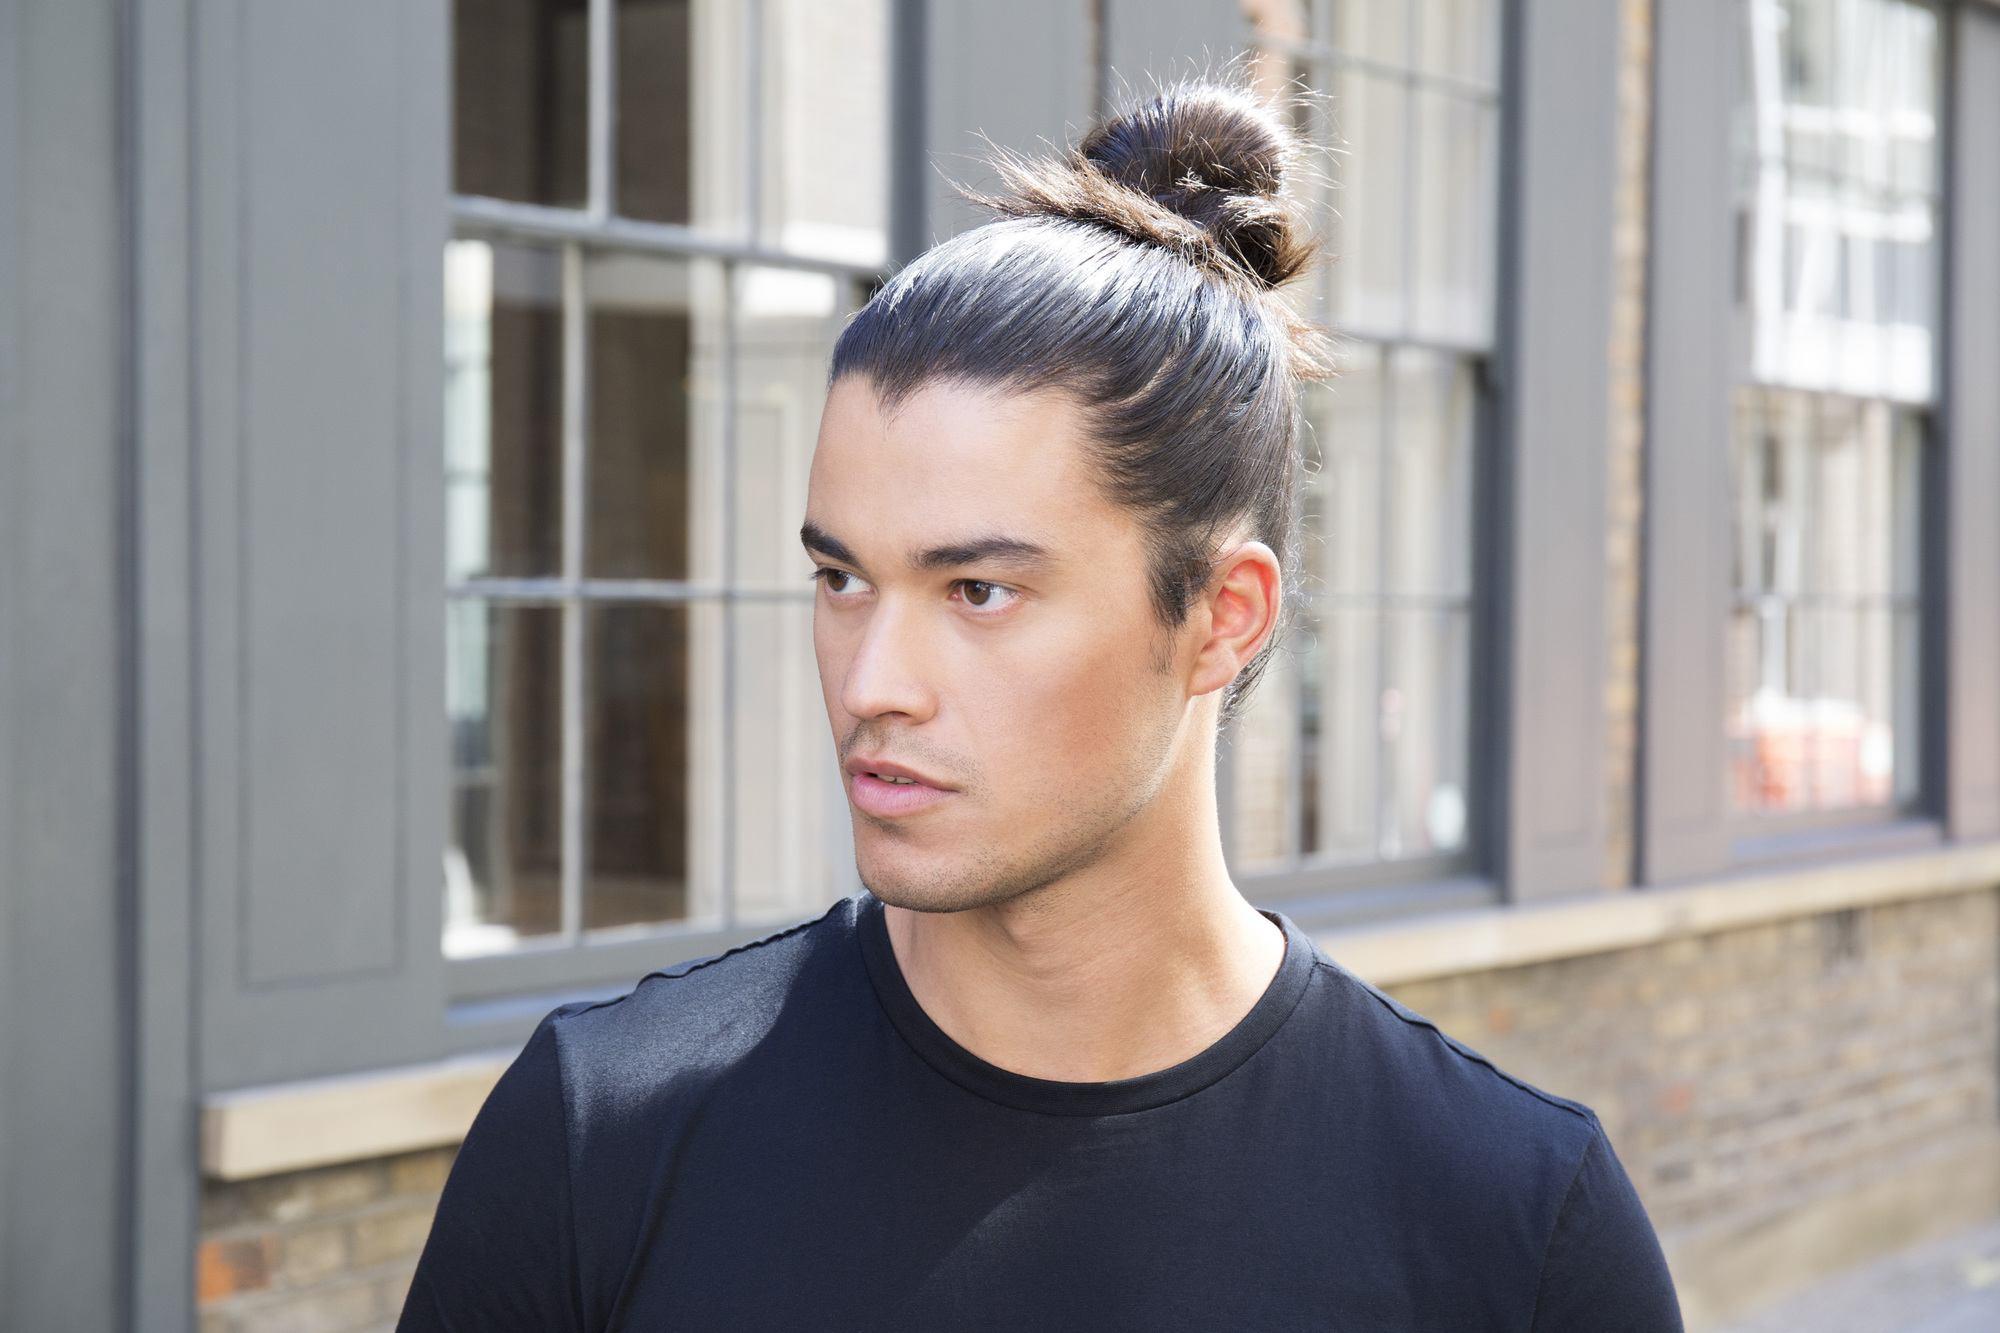 Man bun tutorial brunette man looking away from camera standing in street